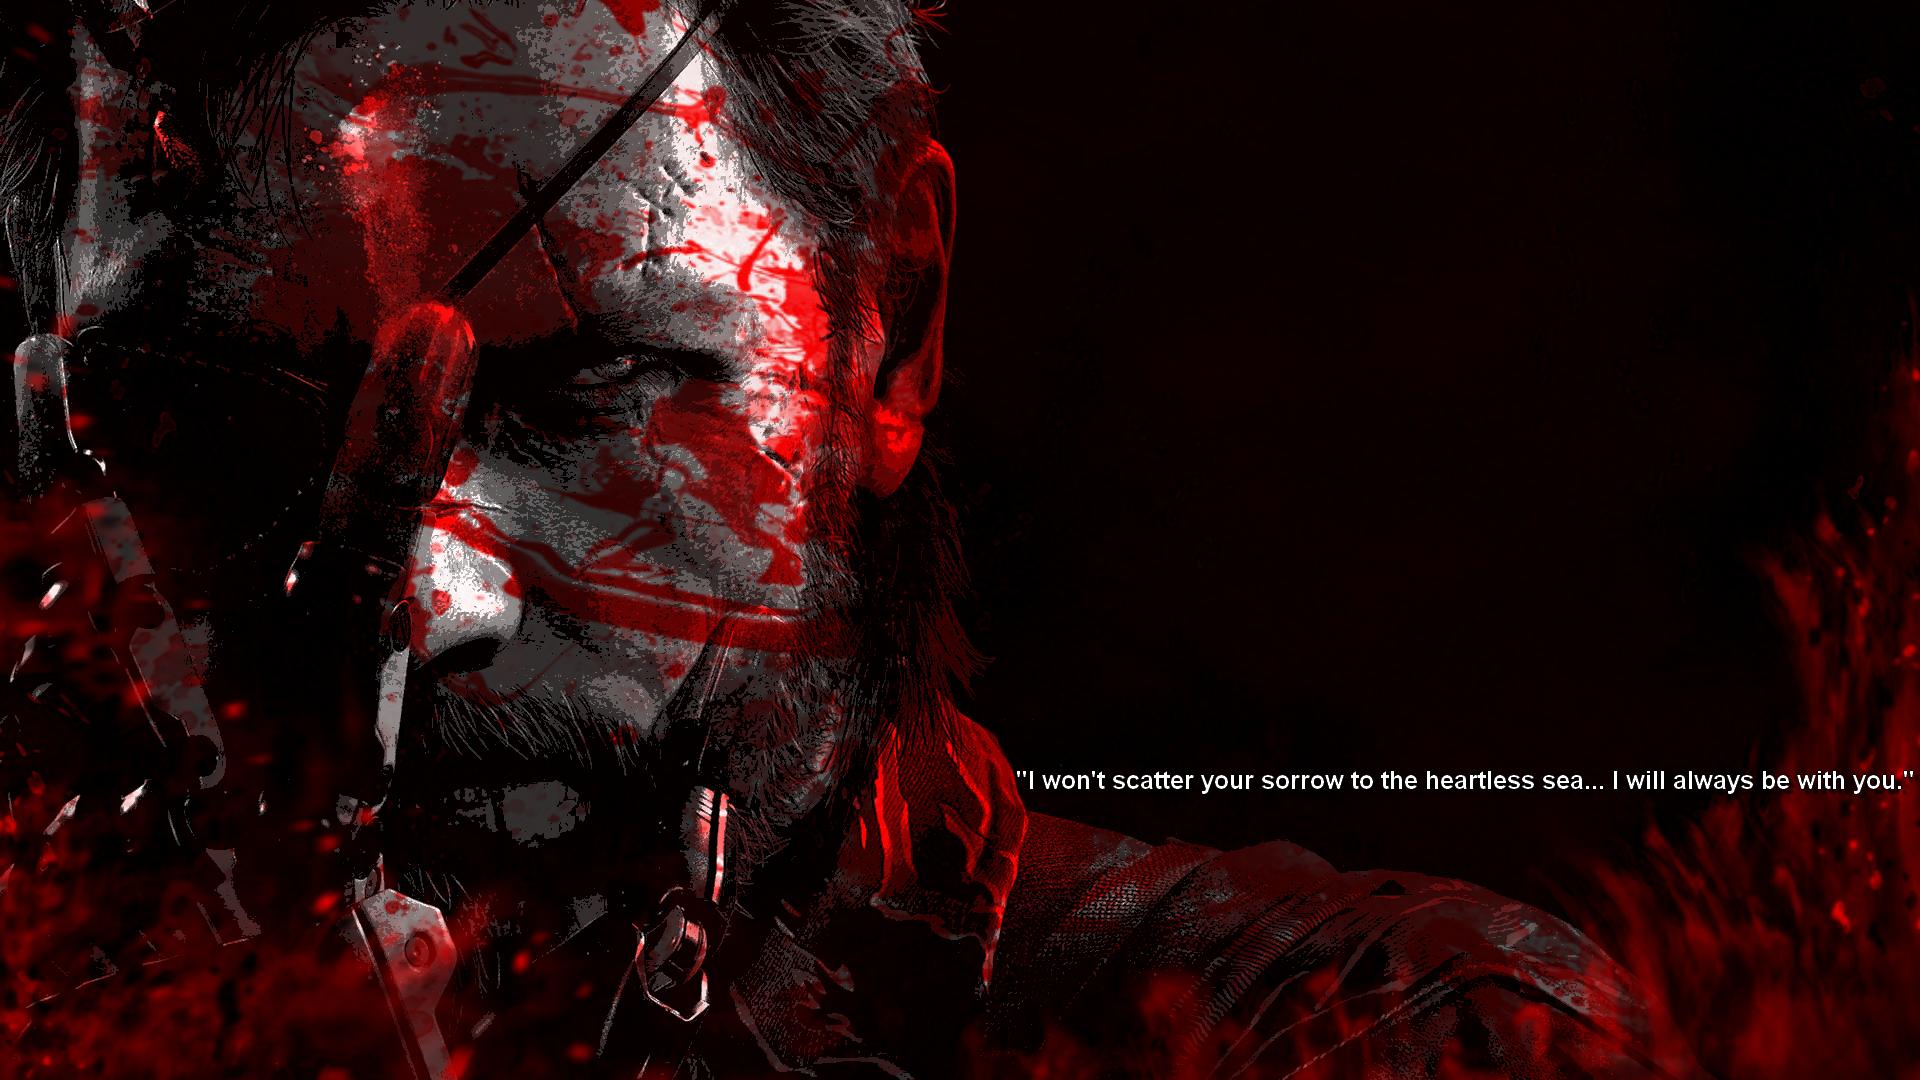 Metal Gear Solid бесплатно